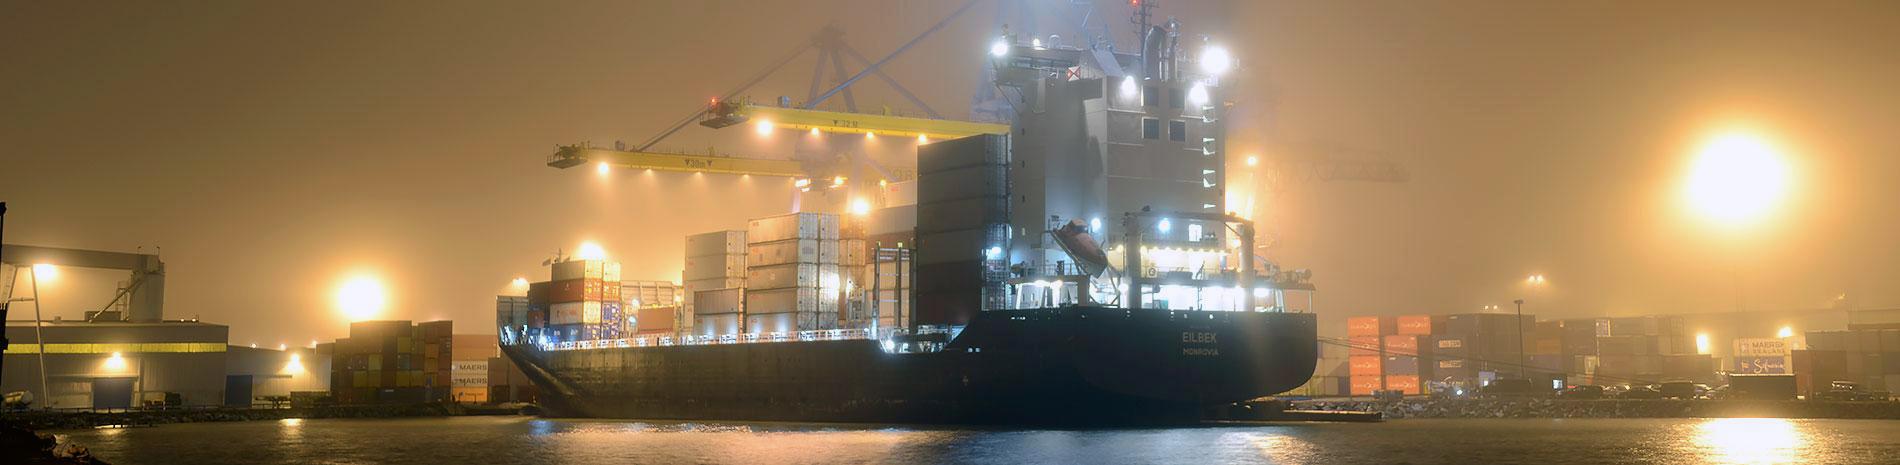 port of finland